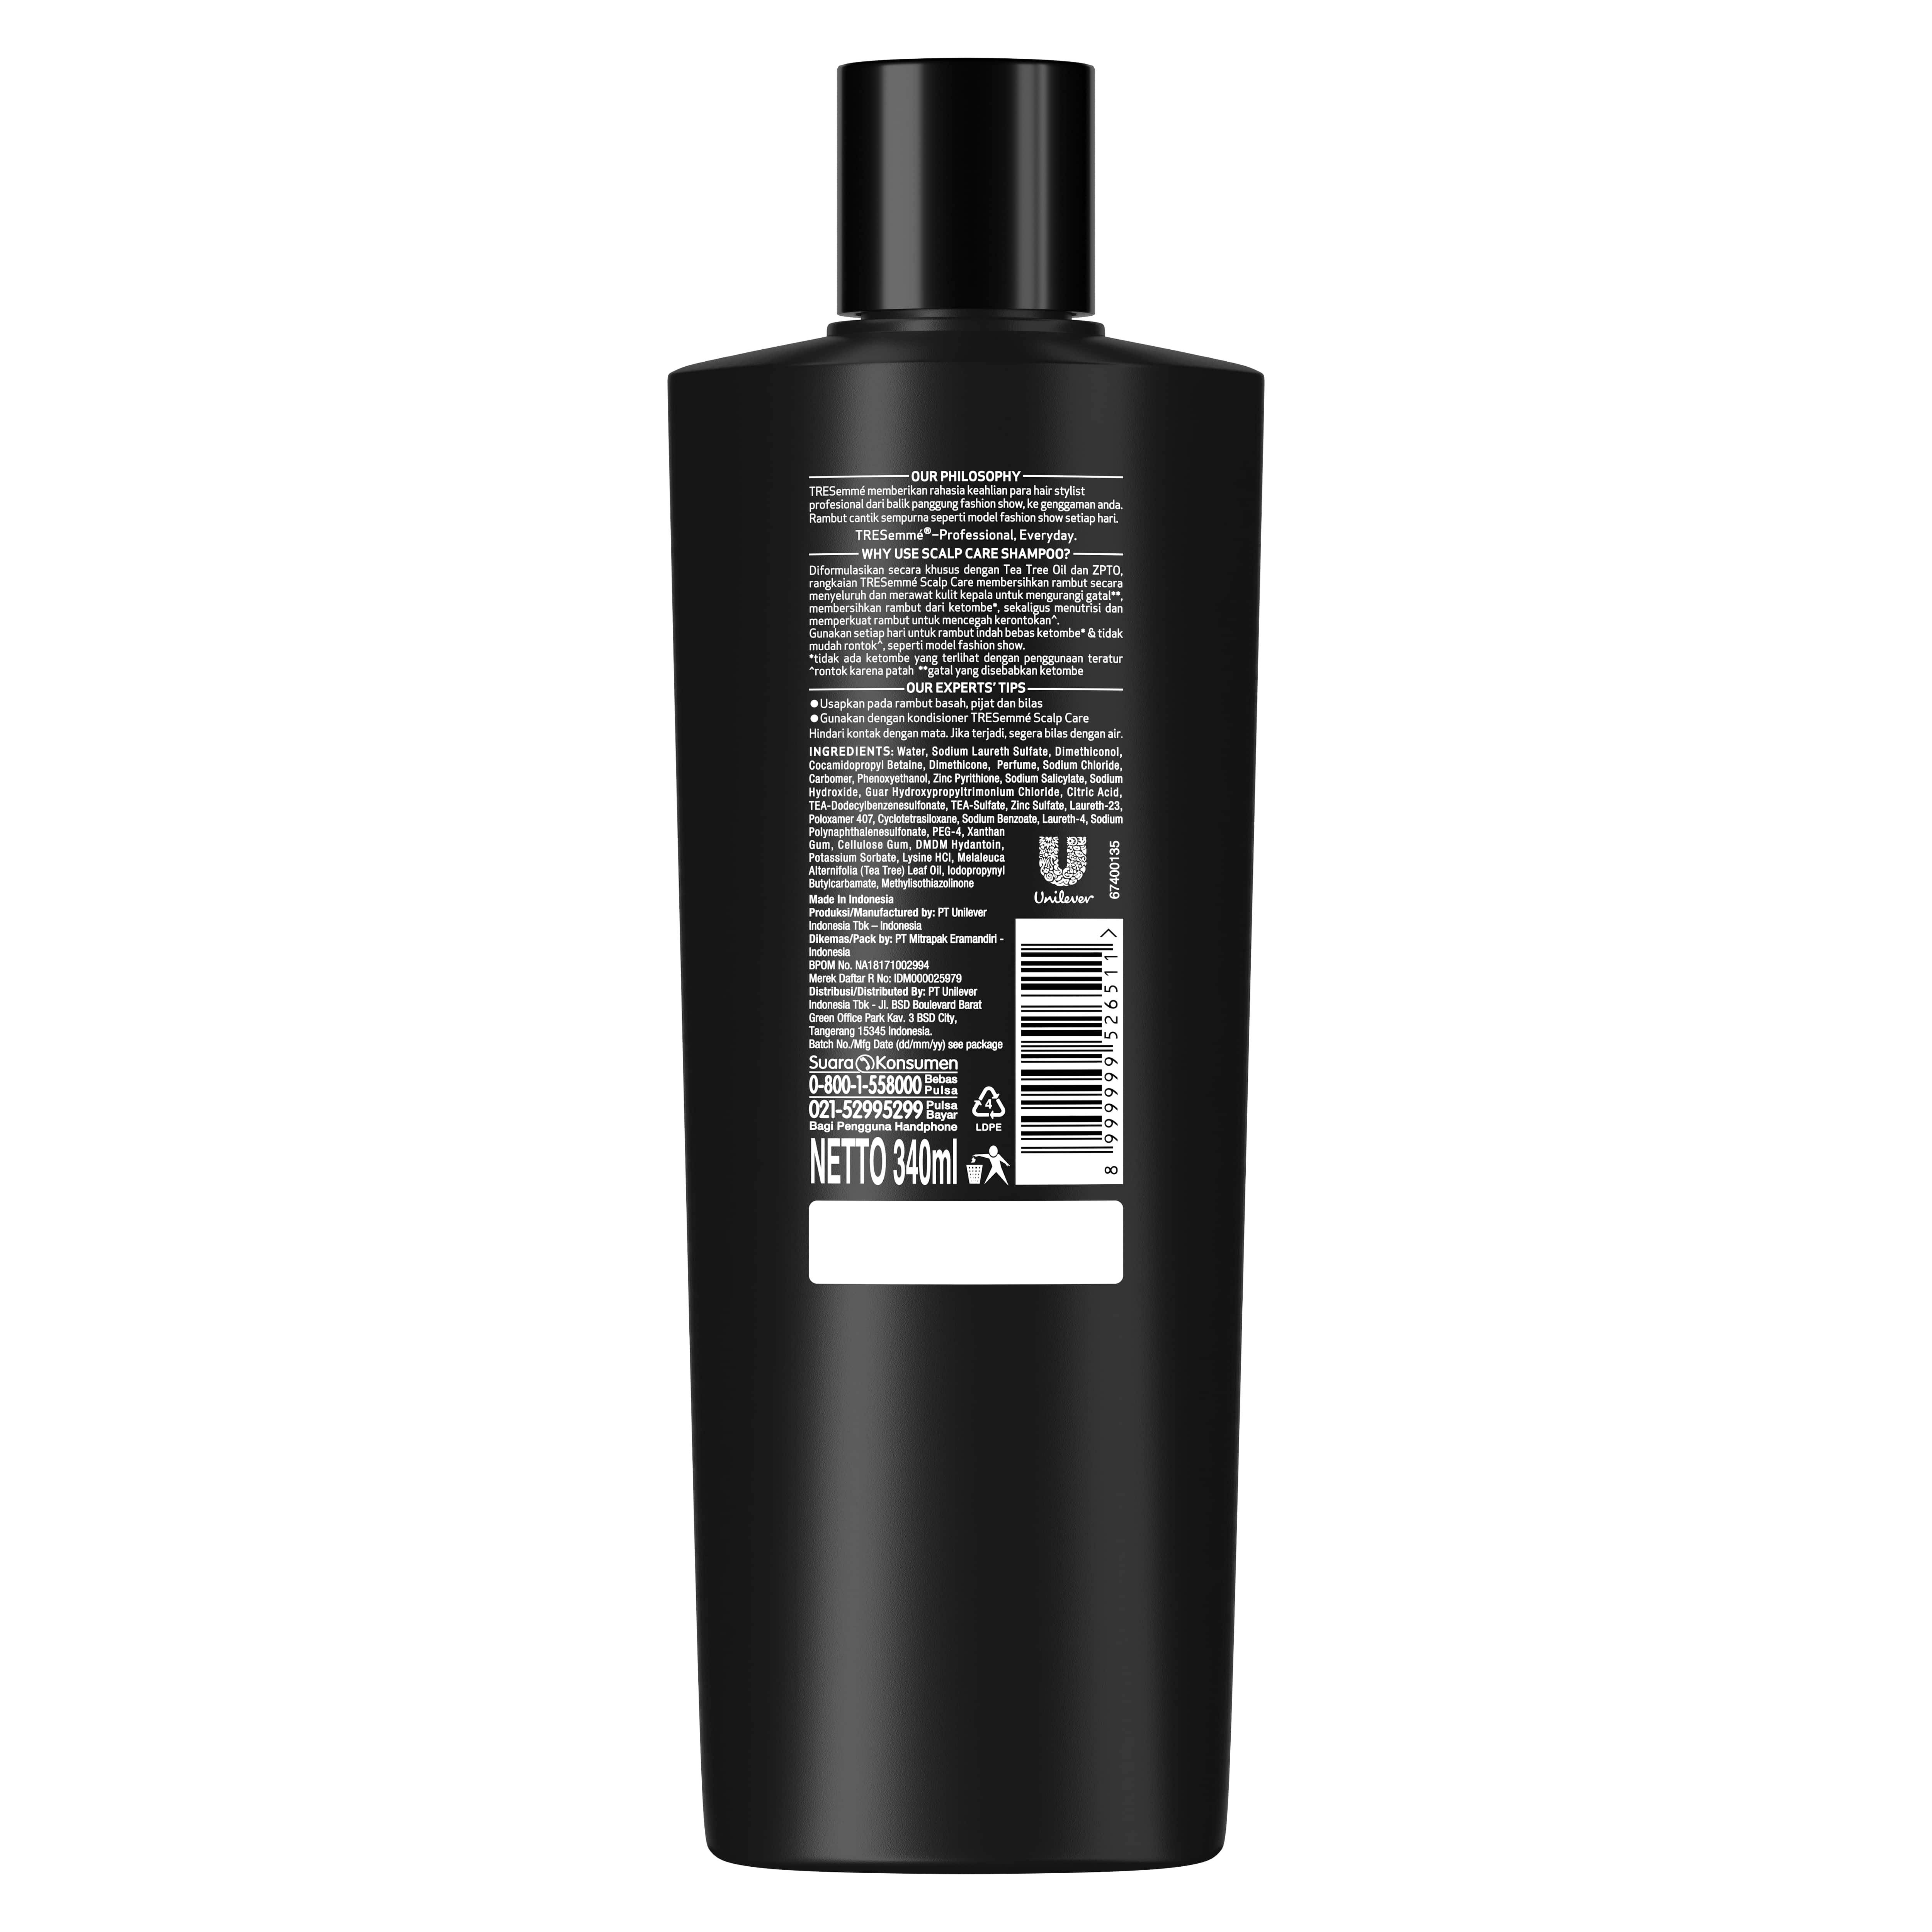 Tresemme Shampoo Scalp Care 340 Ml - Scalp Treatment, Scalp Shampoo, Perawatan Kulit Kepala-2